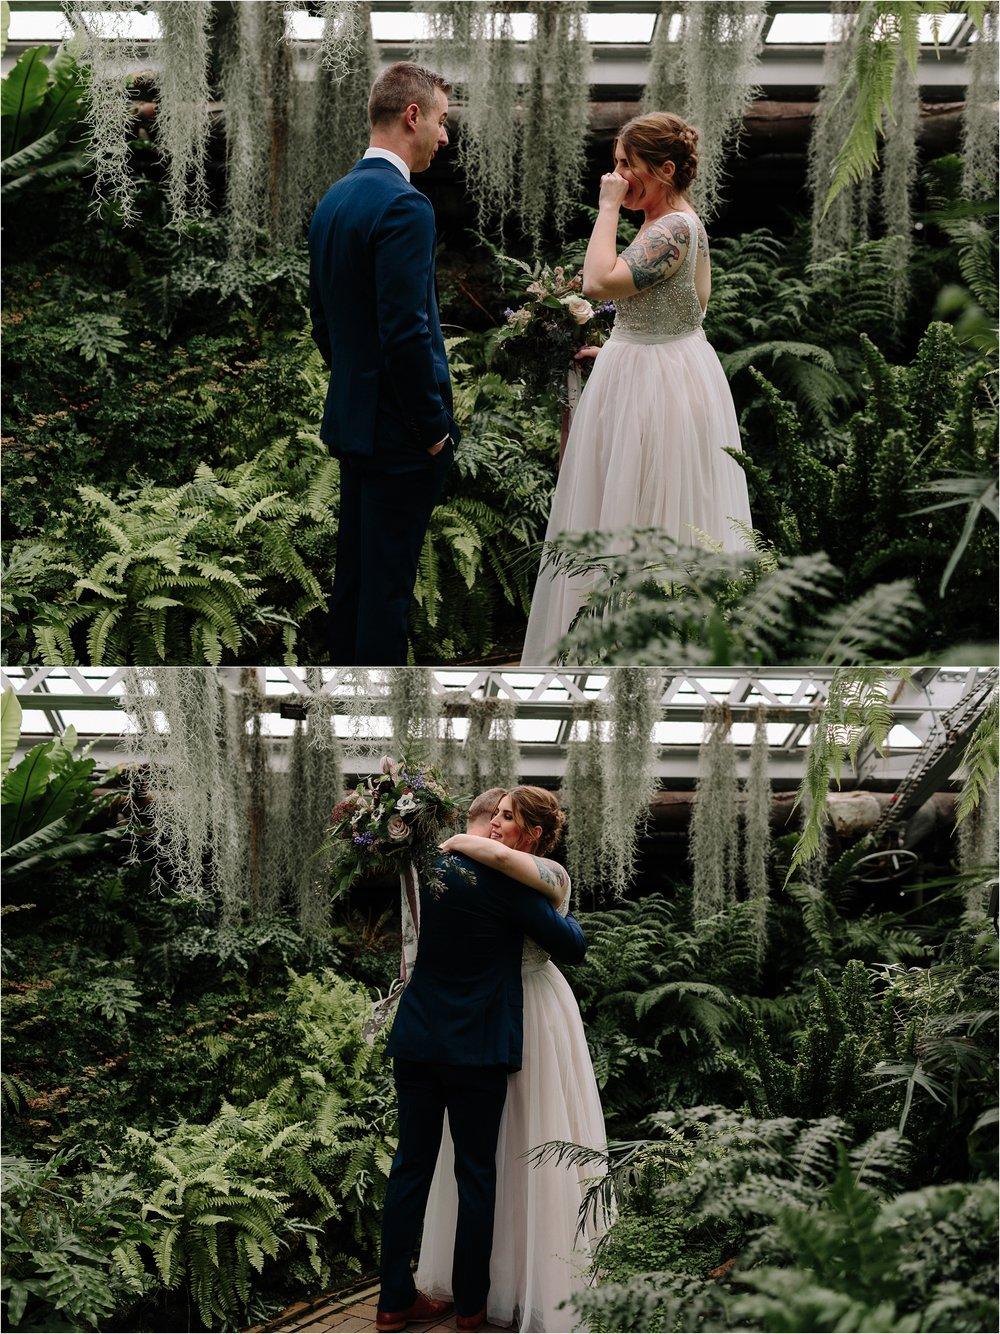 garfield-park-conservatory-wedding-78.jpg